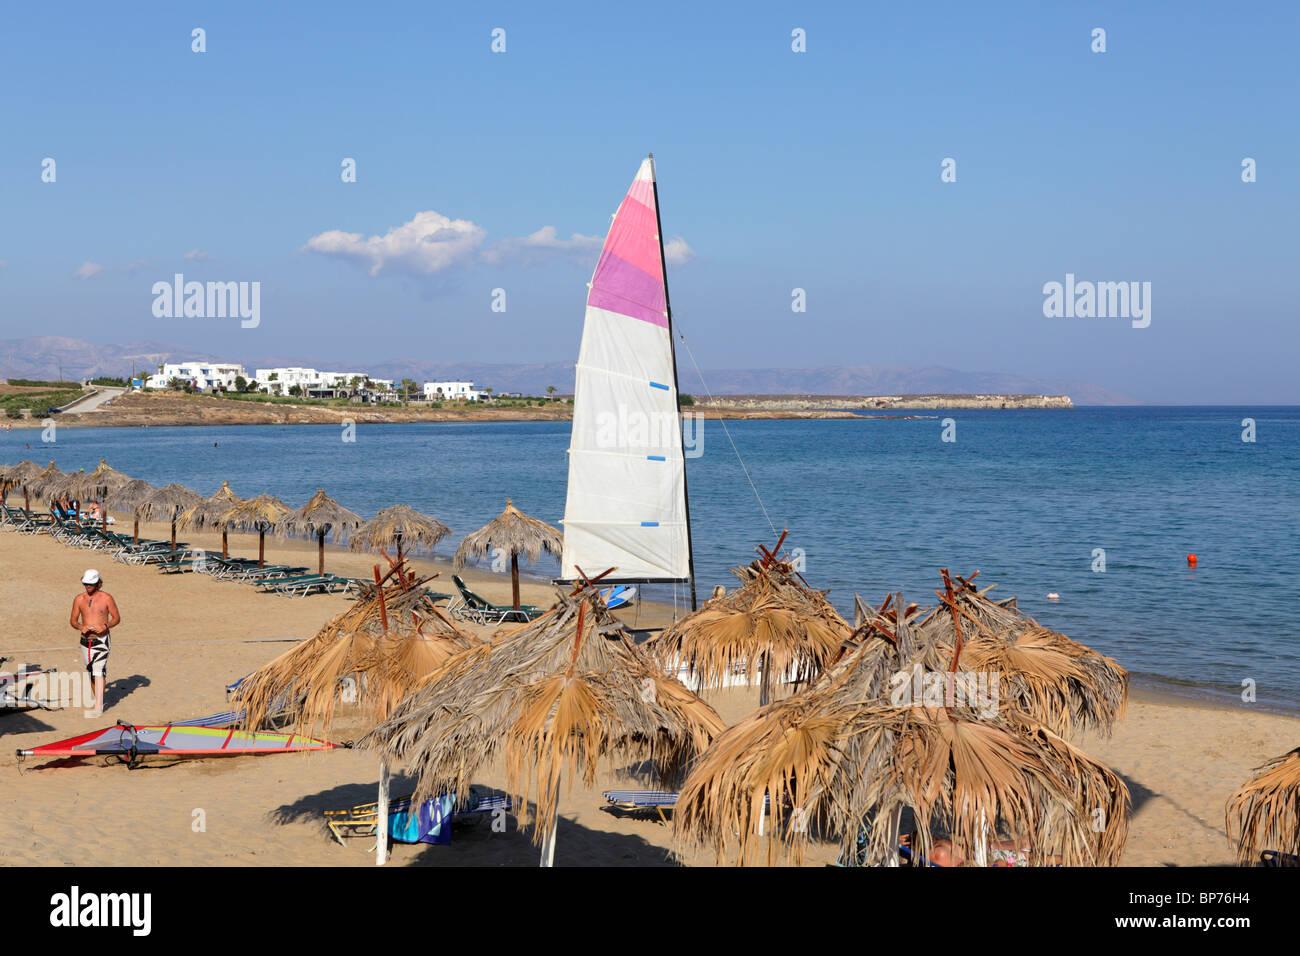 beach Nea Chrissi Akti (golden beach), Island of Paros, Cyclades, Aegean Islands, Greece Stock Photo